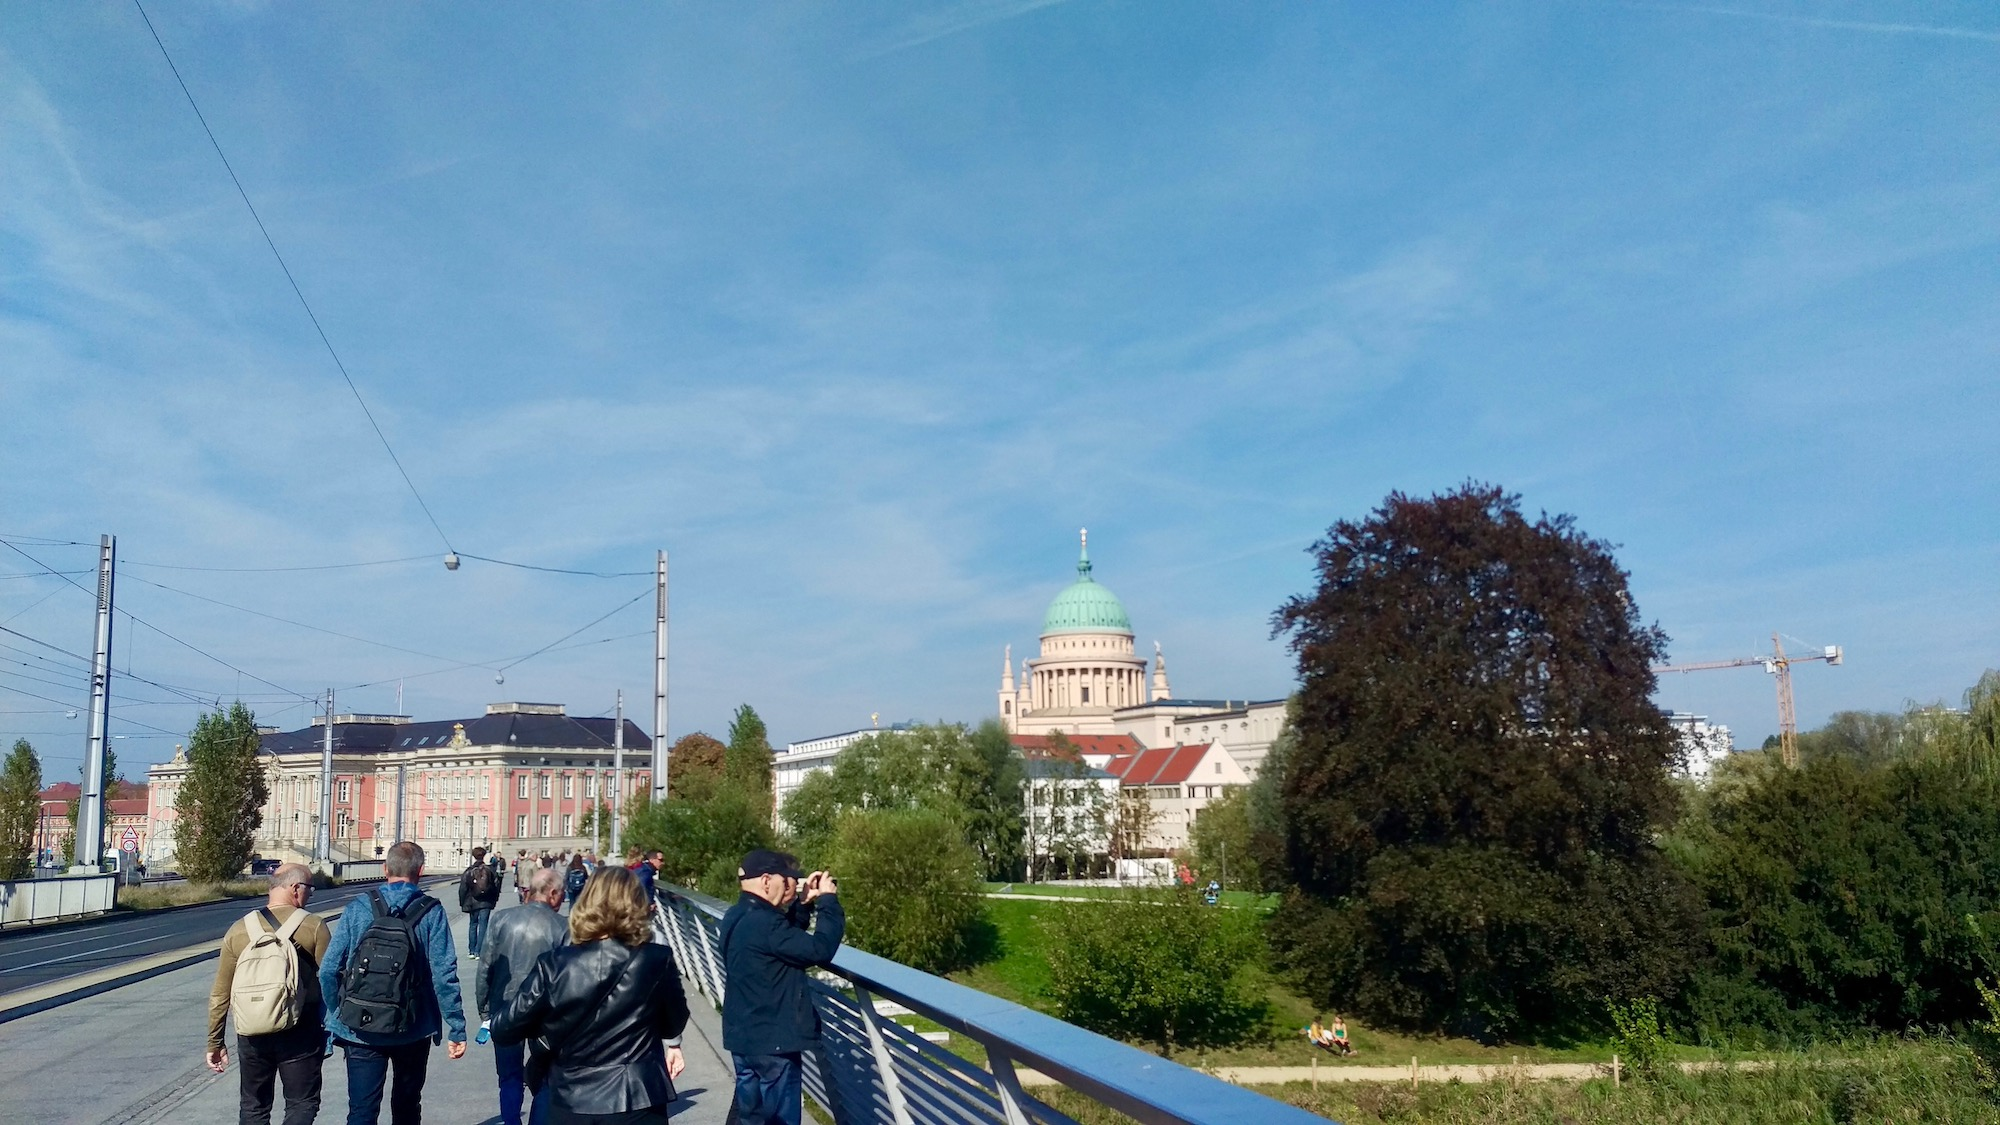 Alte fahrt Potsdam.